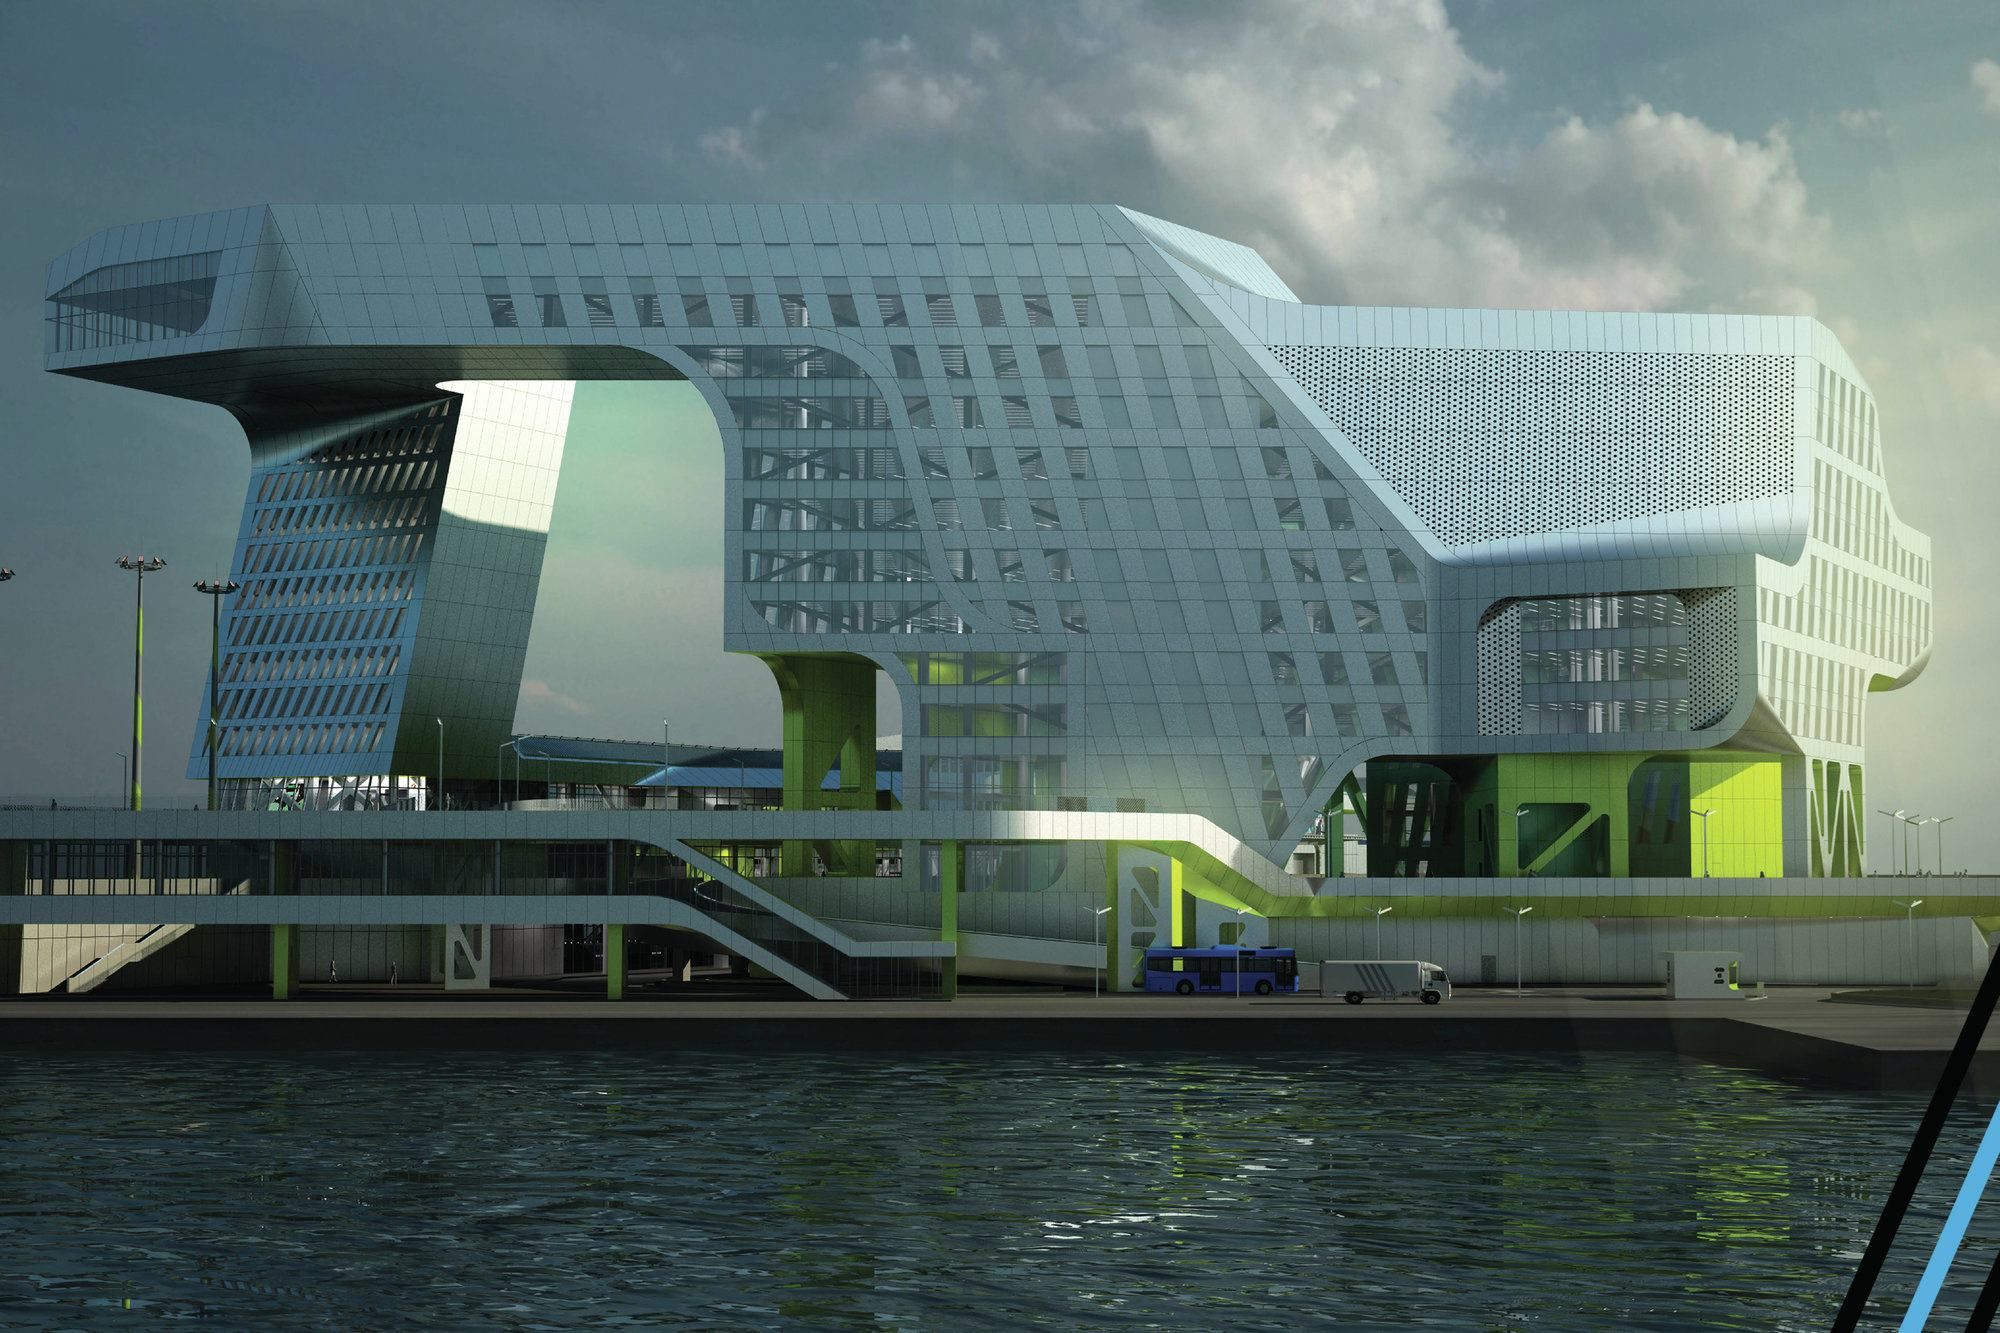 New Keelung Harbor Service Building Designed By Neil M Denari Architects Architect Magazine